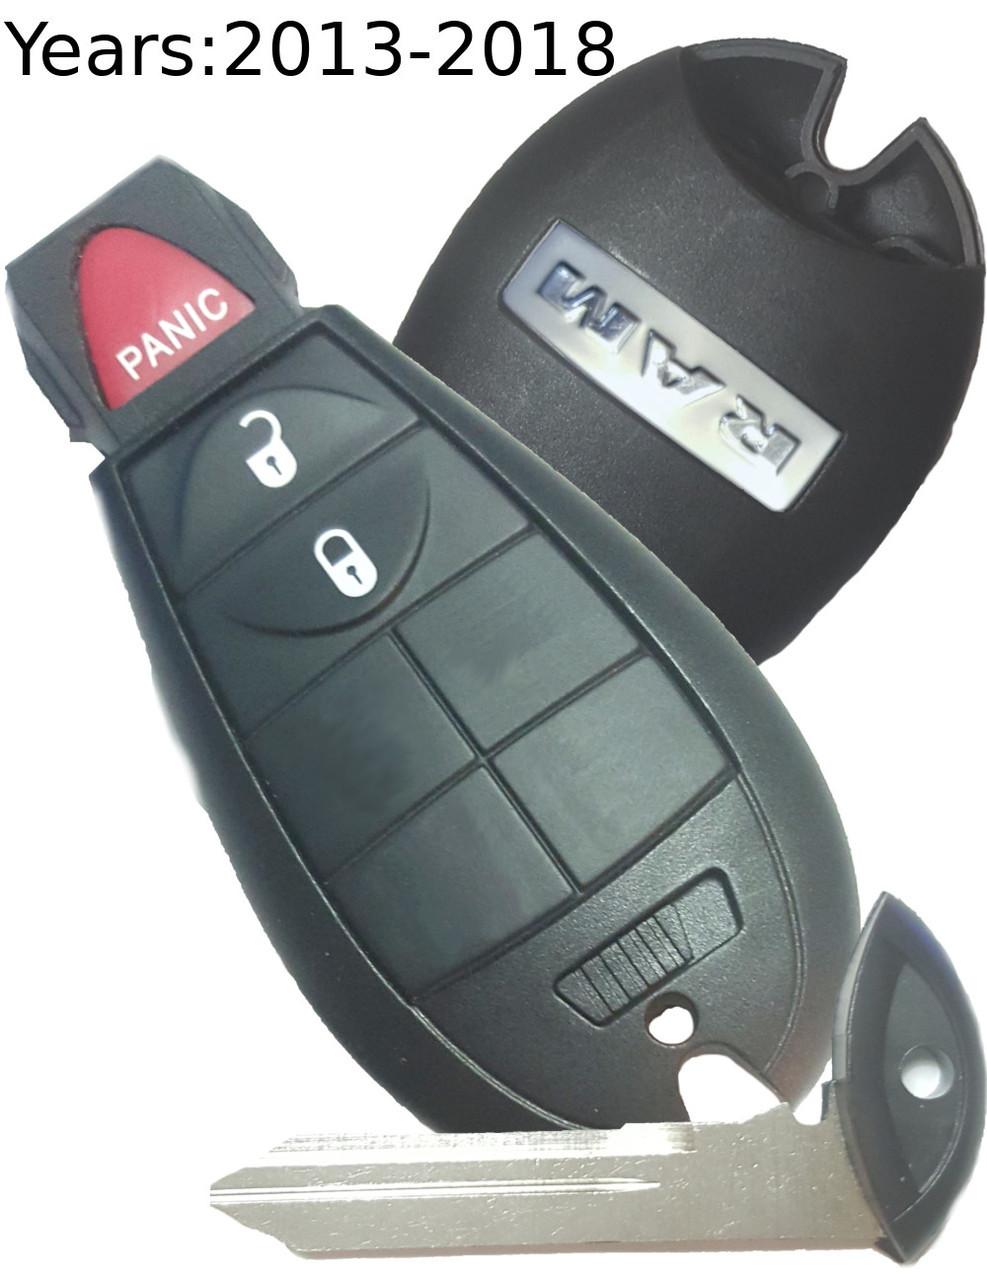 medium resolution of 2013 to 2017 dodge ram 3 button remote key